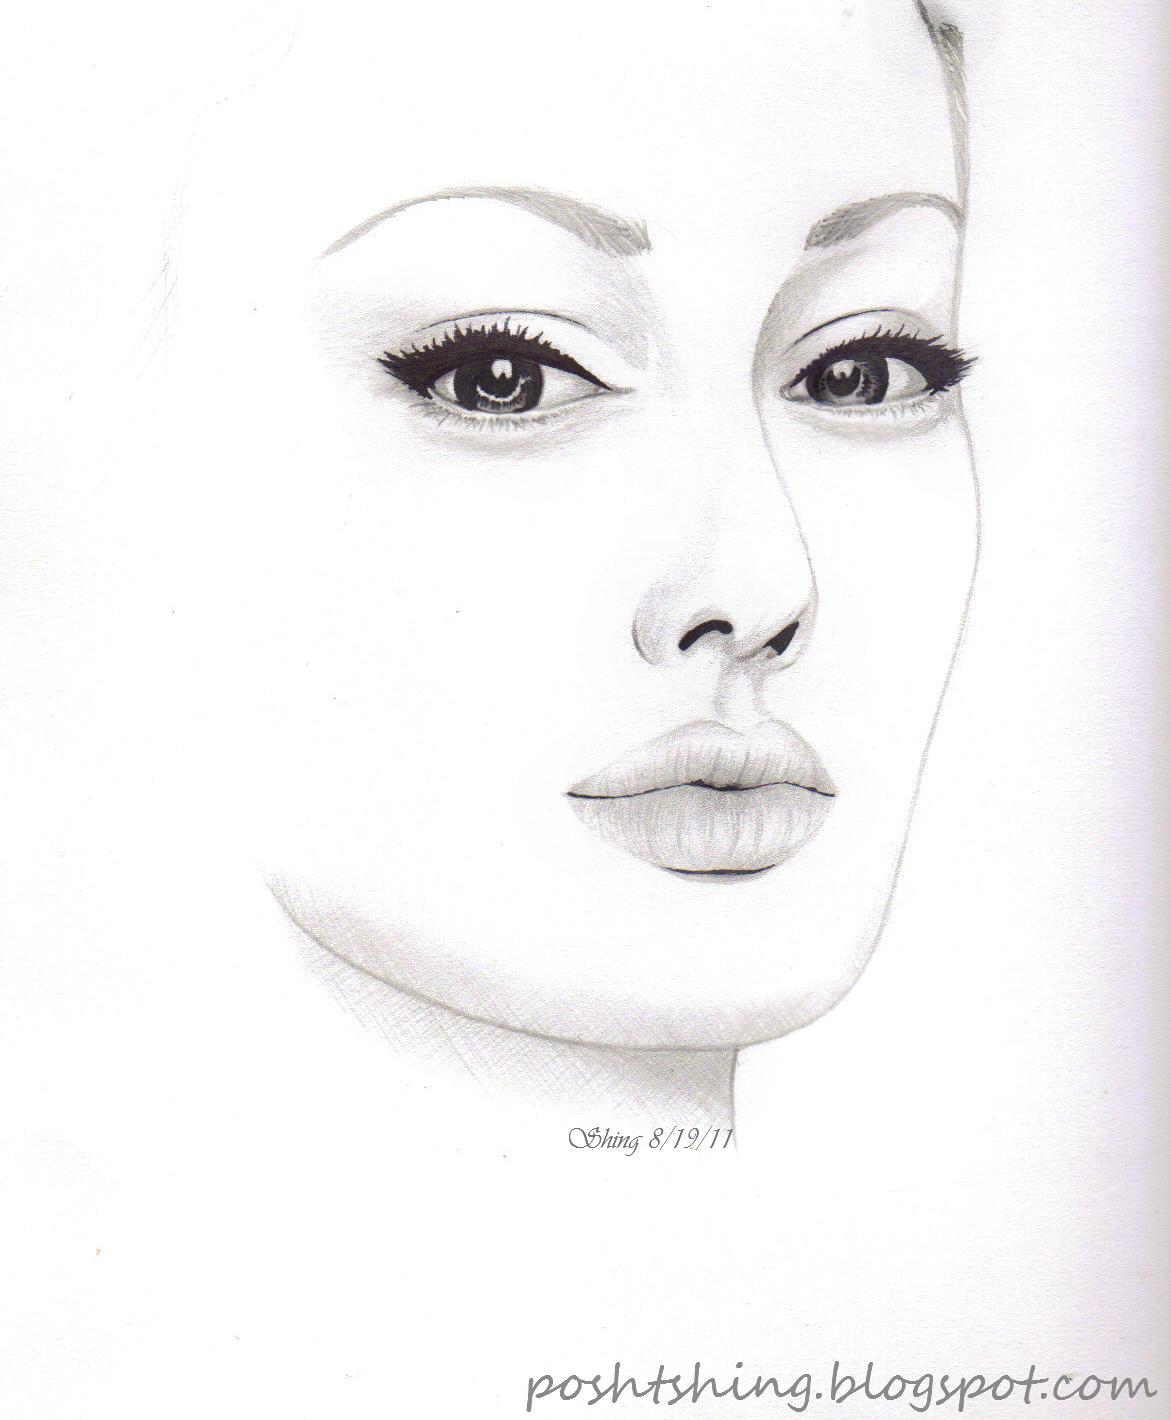 http://3.bp.blogspot.com/-8nOMmgNjwl8/TlQGeSg6vZI/AAAAAAAAAqo/h9PQ16PizBQ/s1600/angelina+j.+sketch_px.jpg